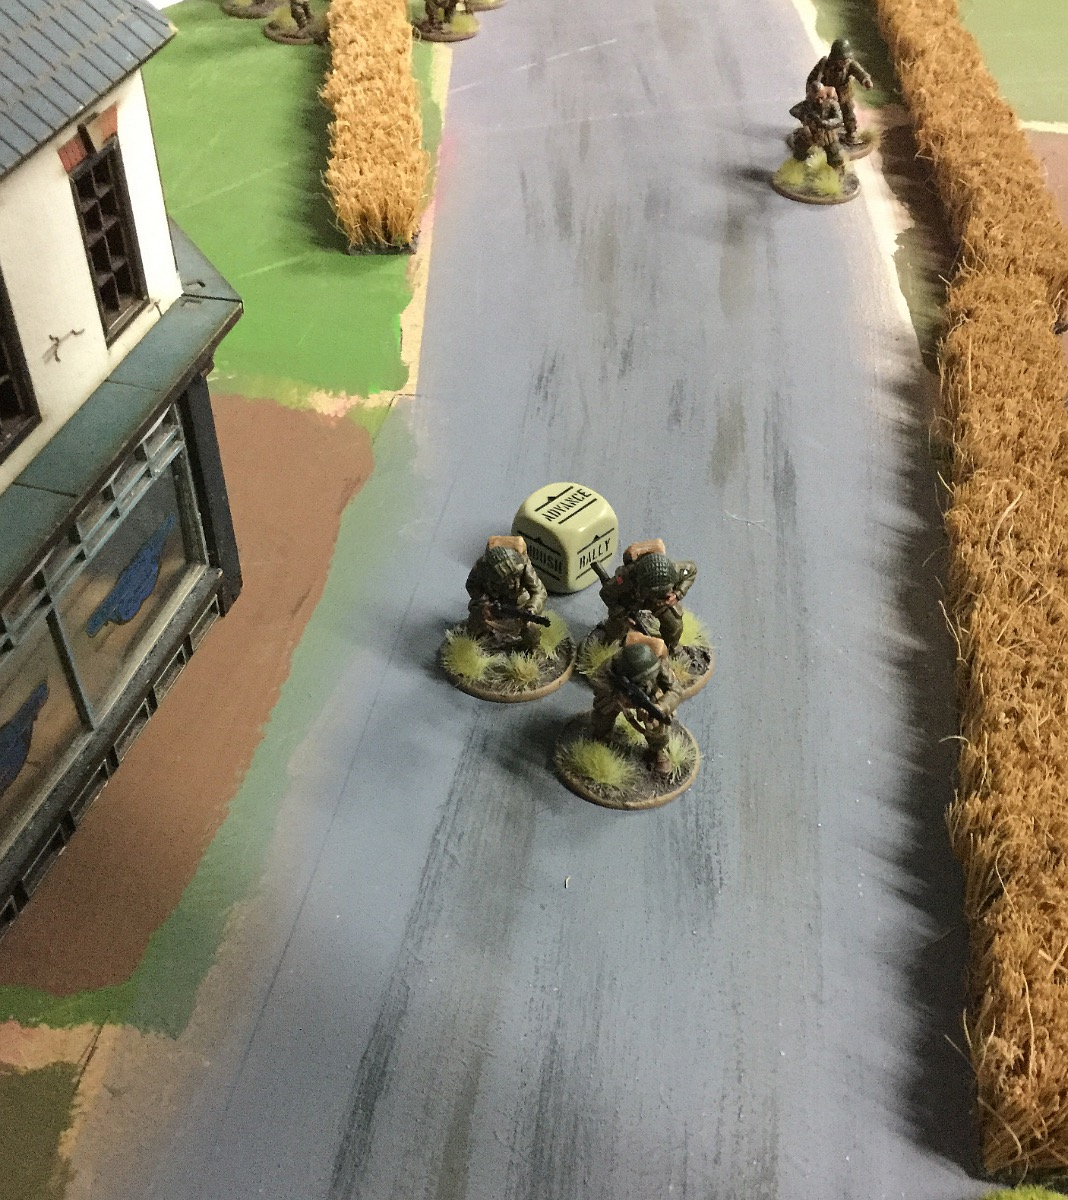 Brandenburgers versus Allies in a fierce infantry engagement